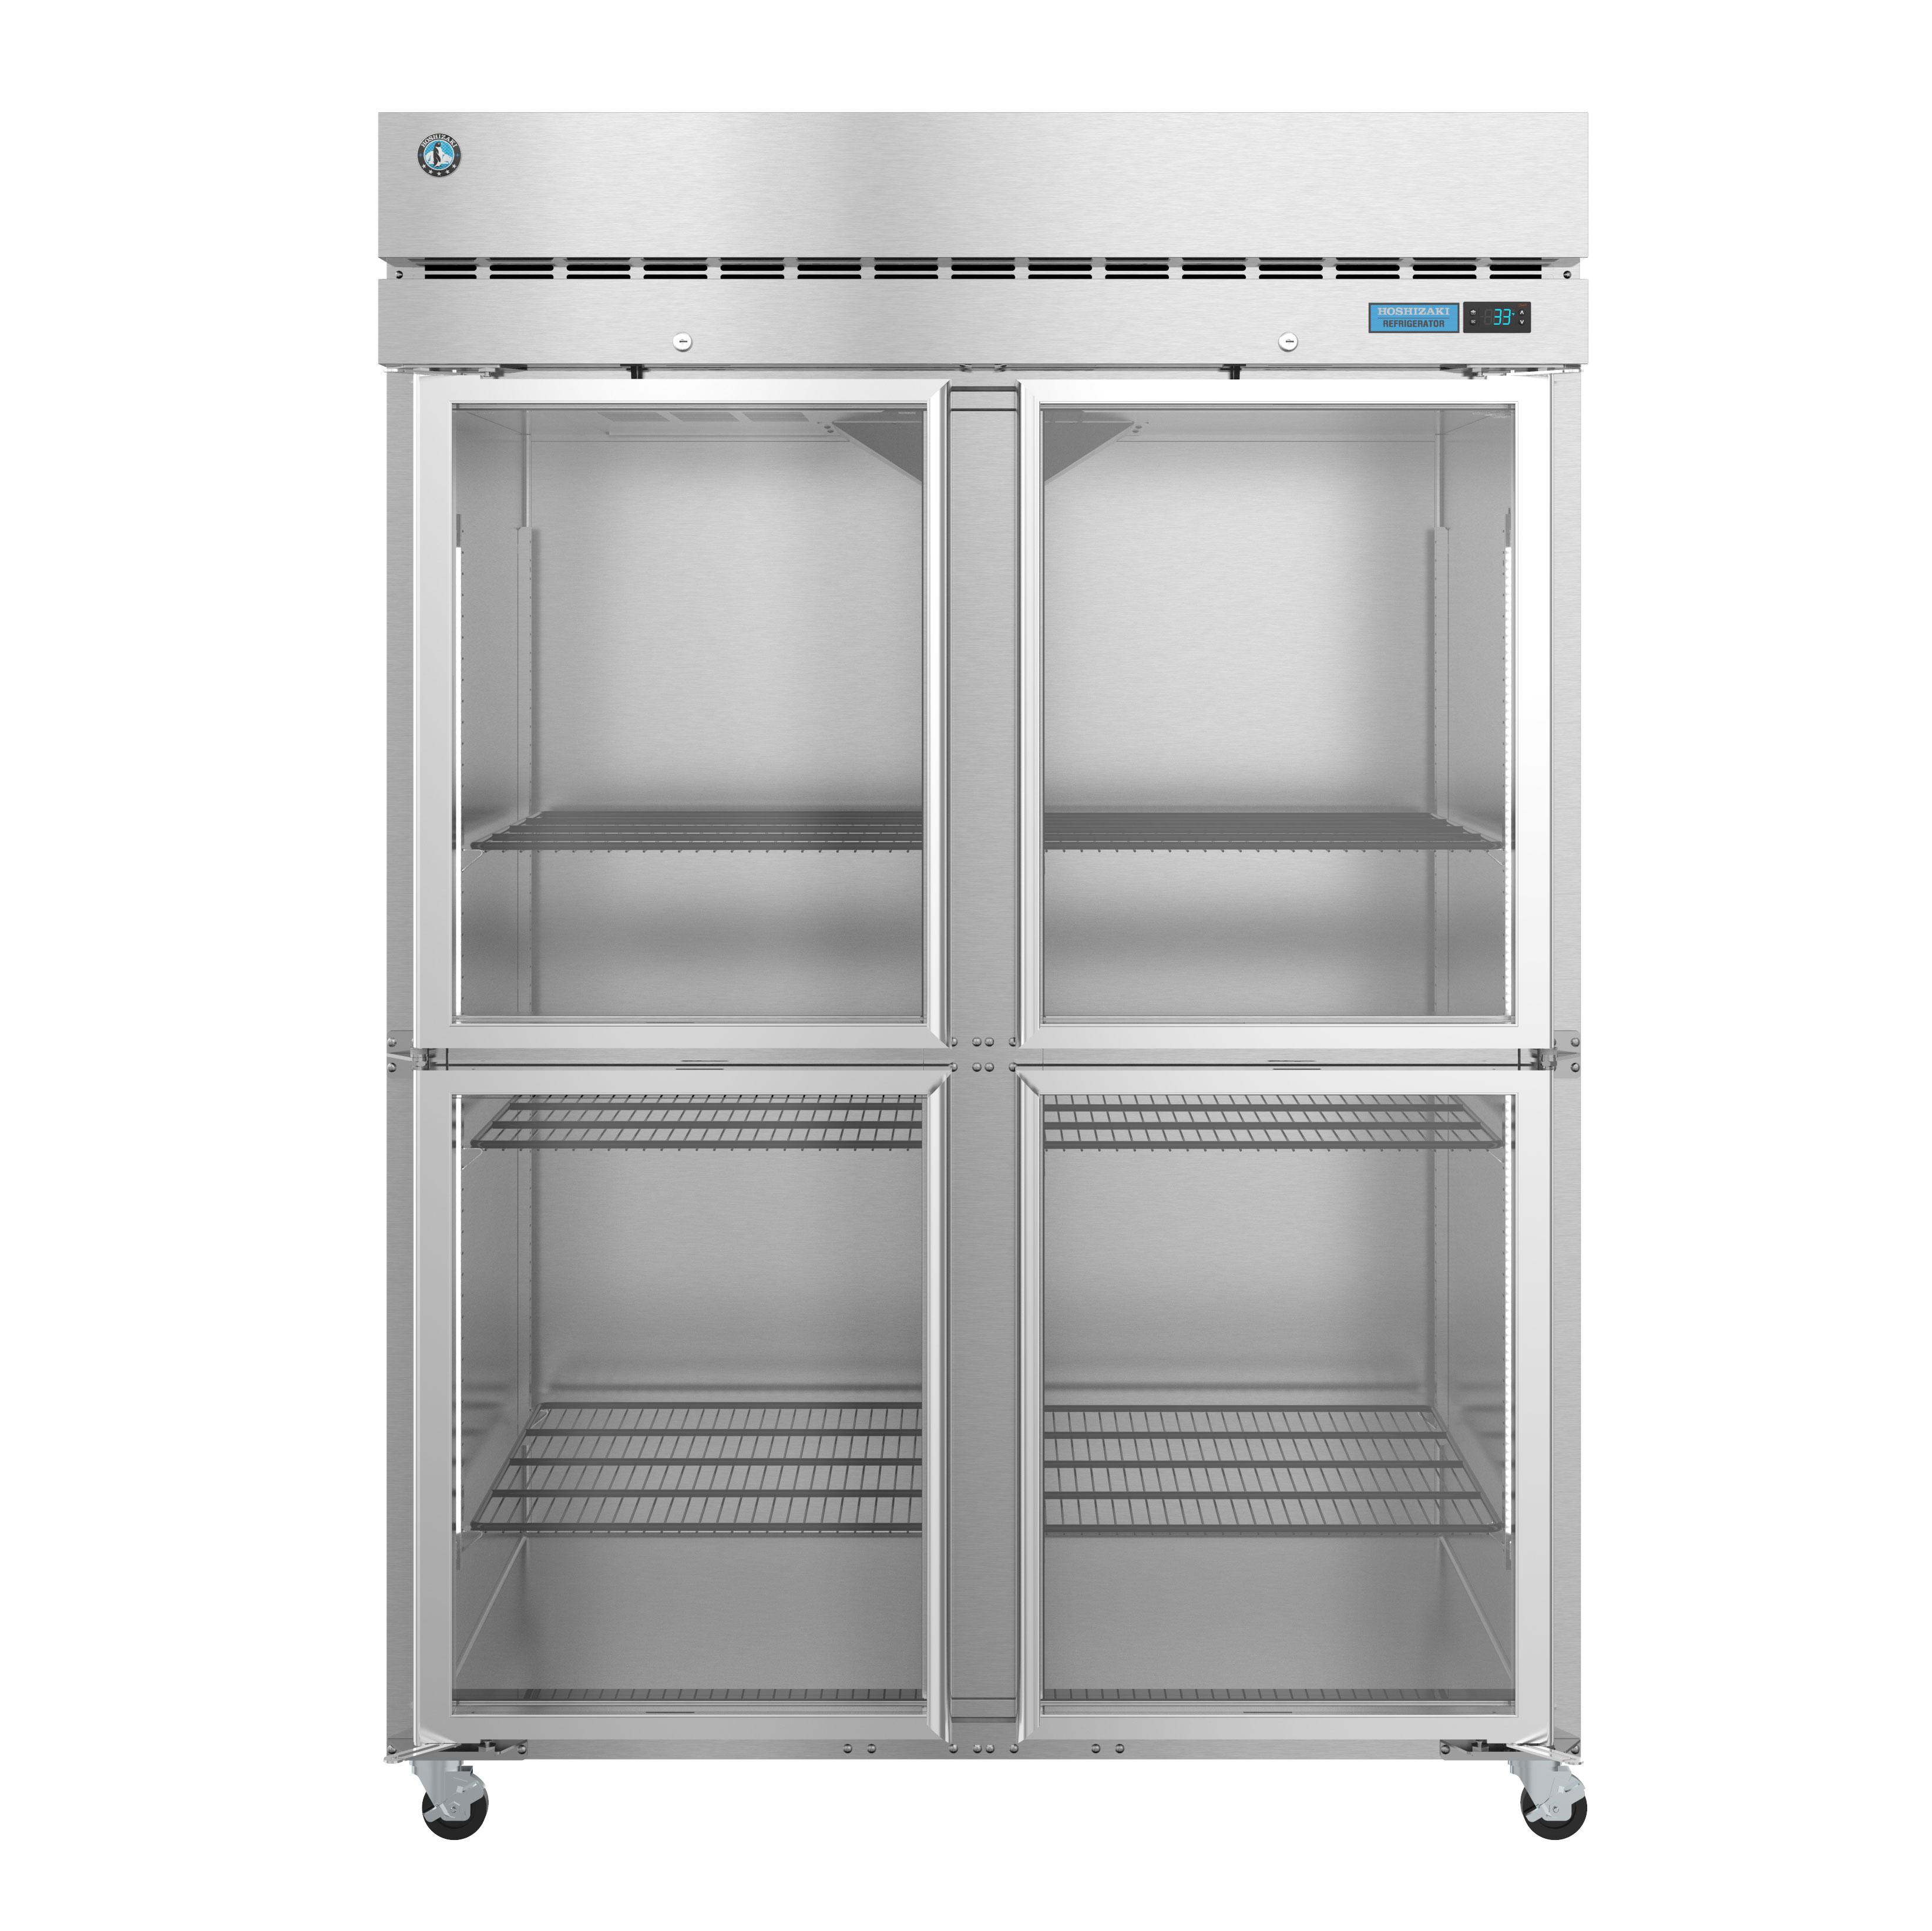 Hoshizaki R2A-HG reach-in refrigerators & freezers